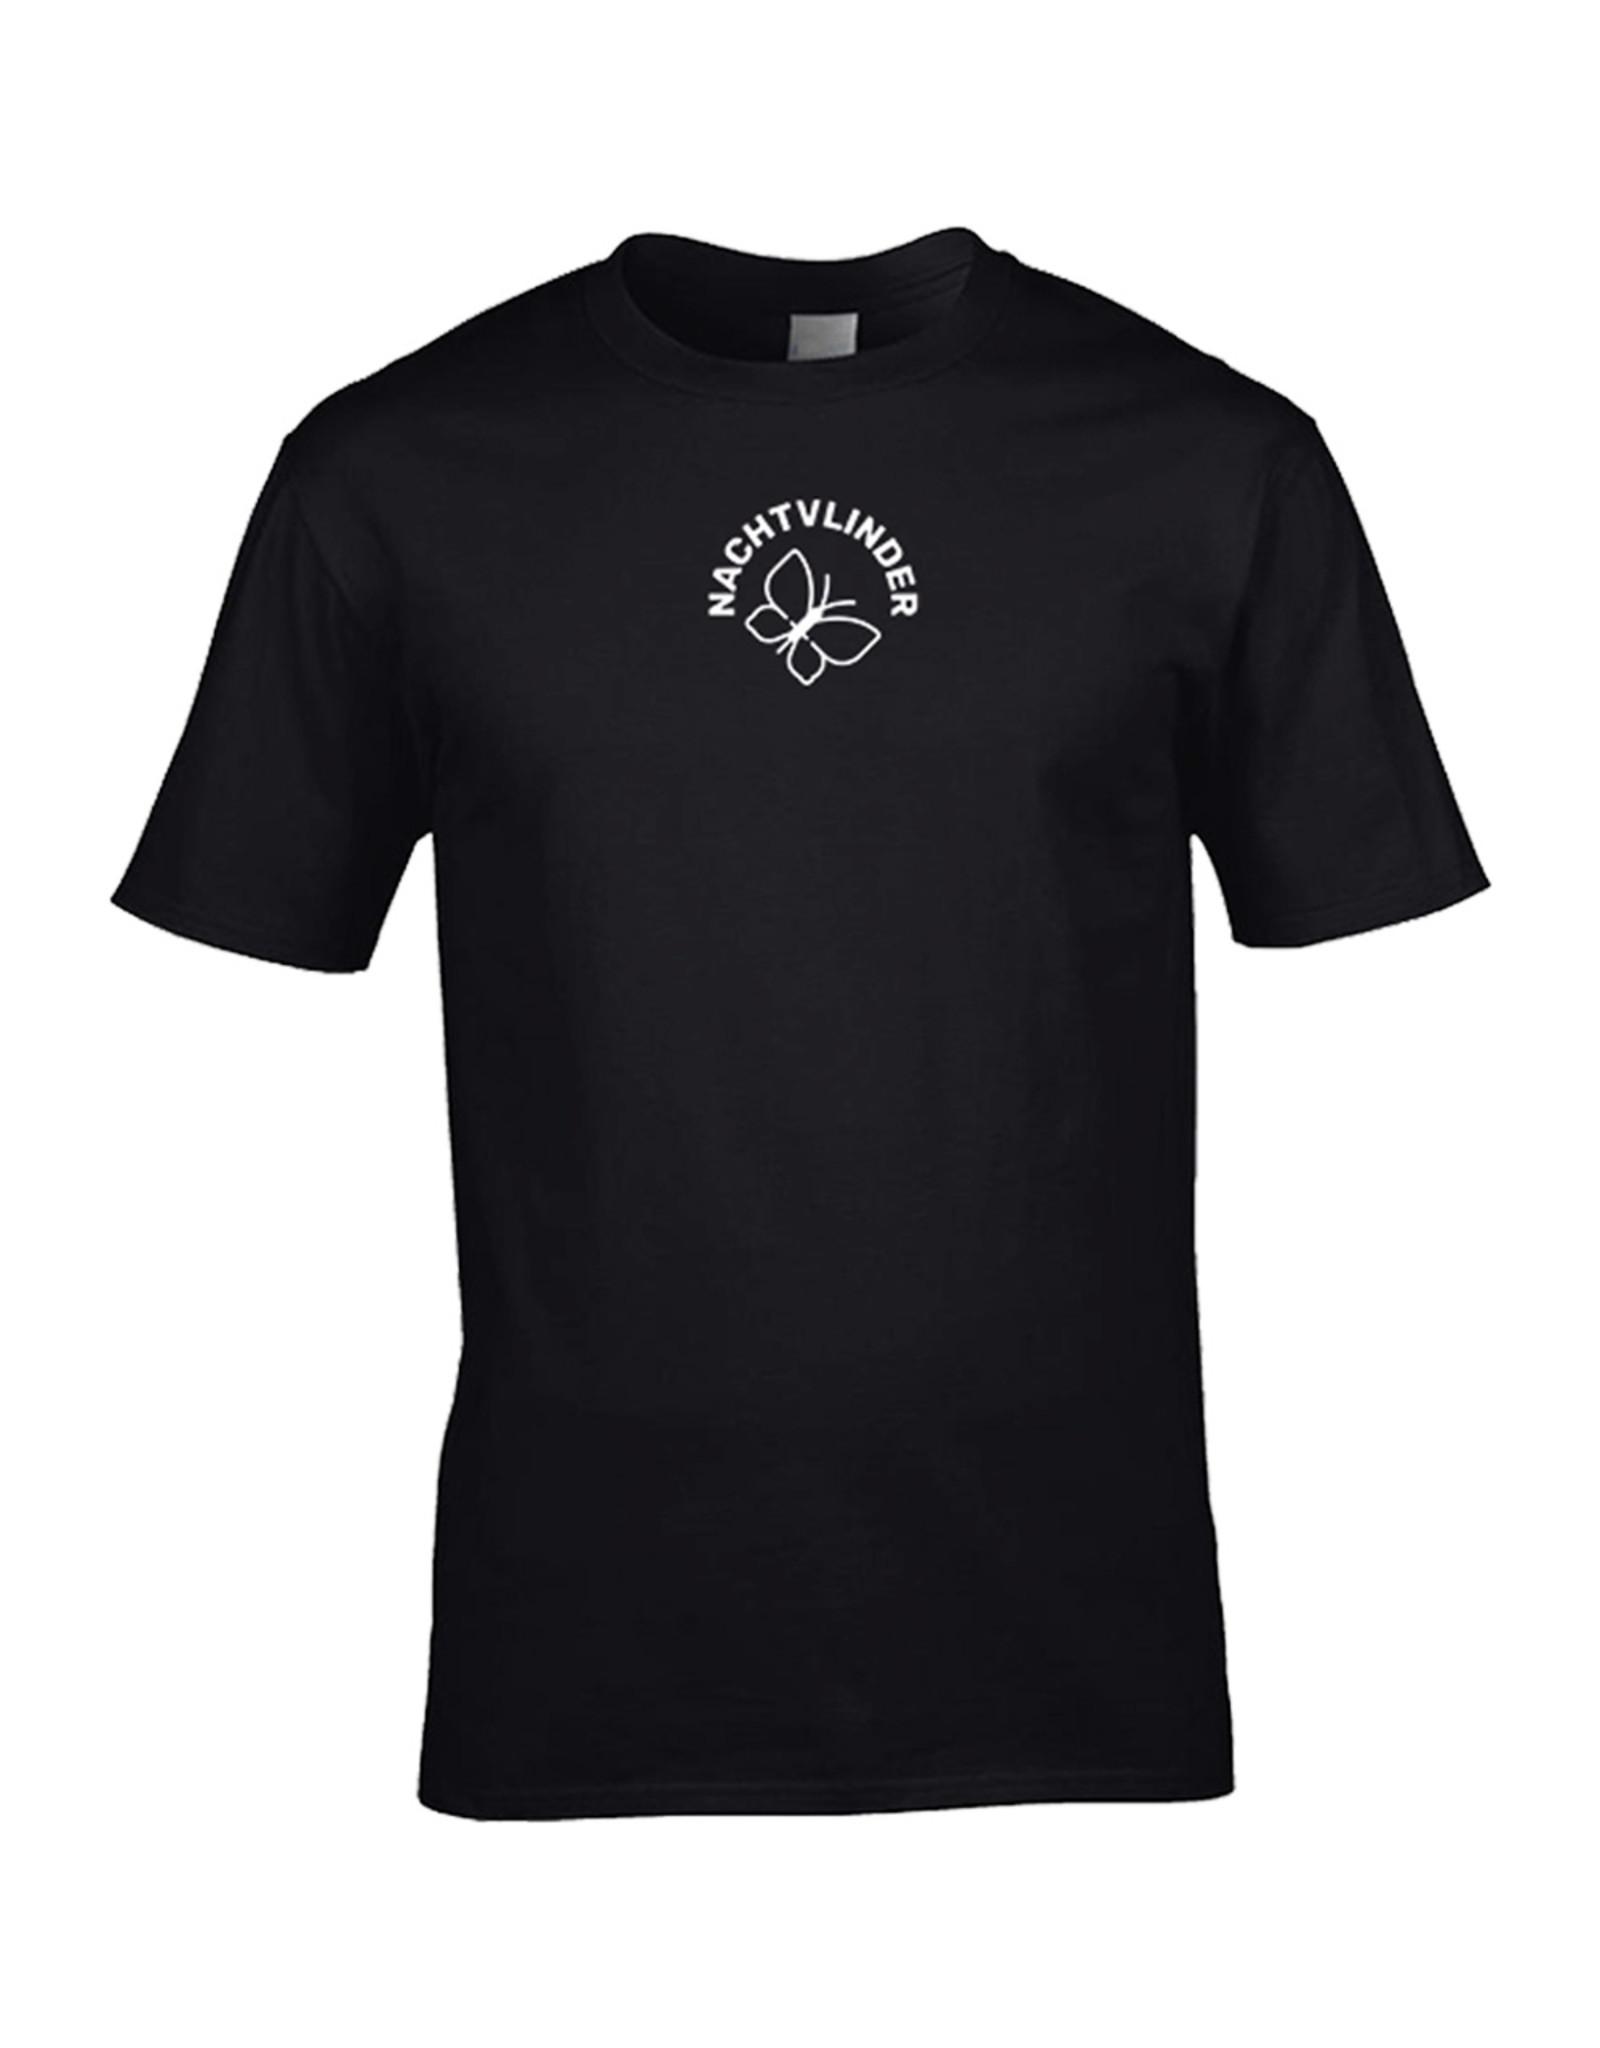 Festicap T-Shirt Nachtvlinder | Soft Cotton | Handmade by us